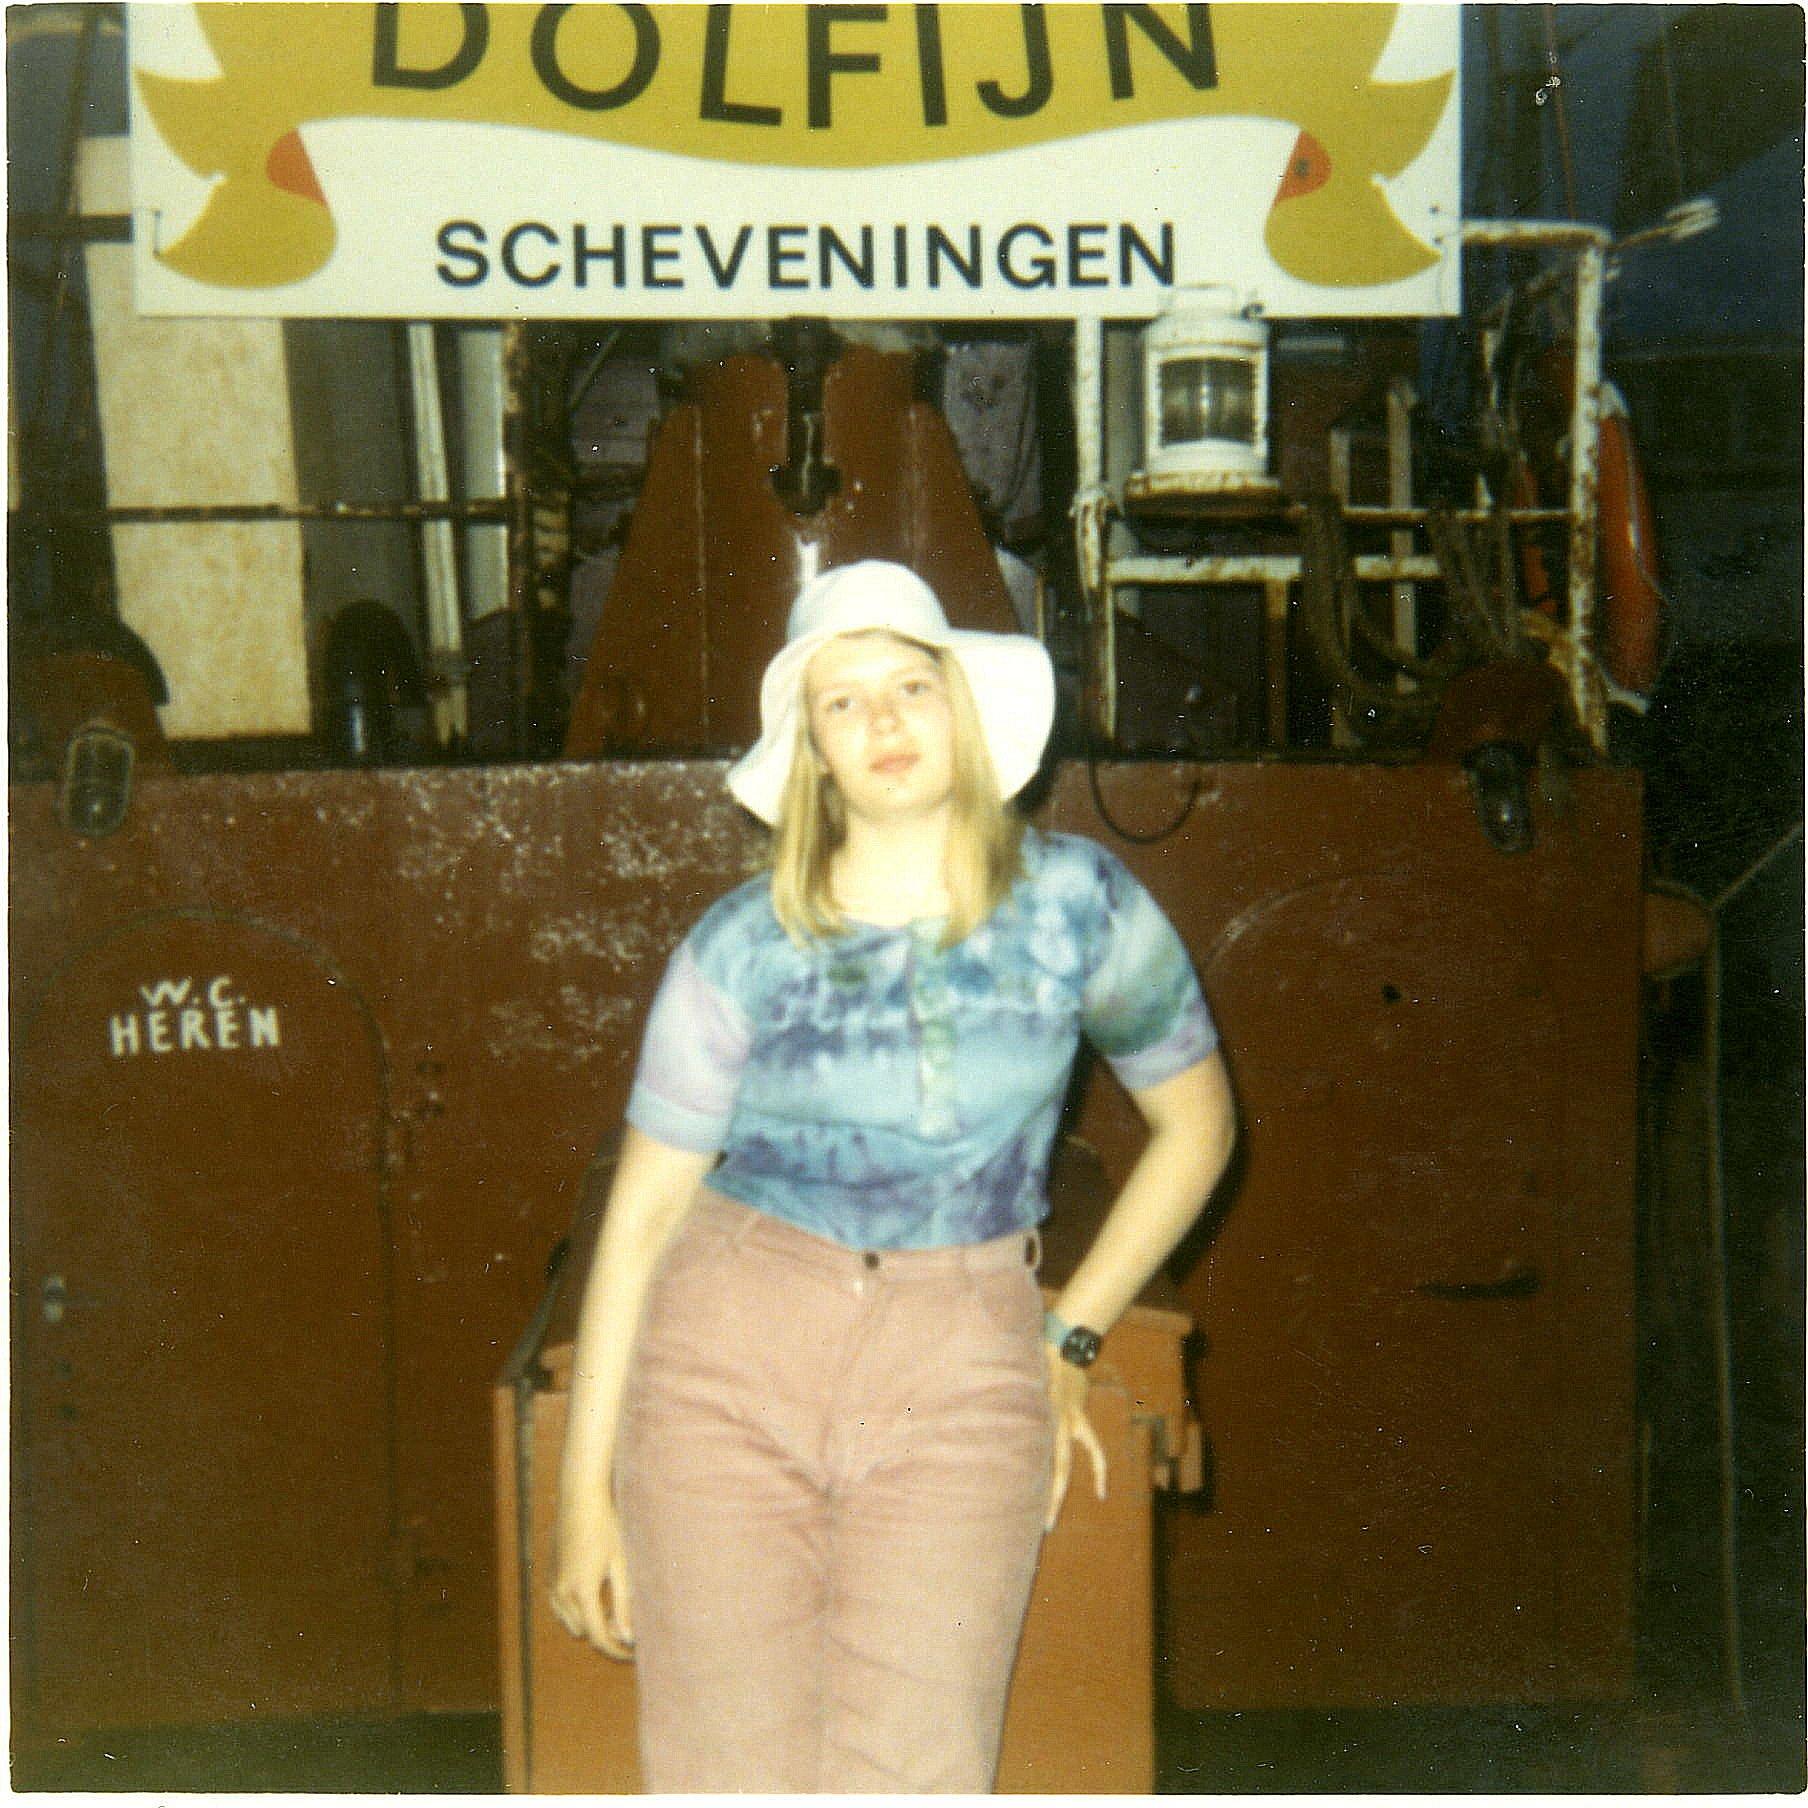 Kathy Jeanette en-route RNI File2297-1971